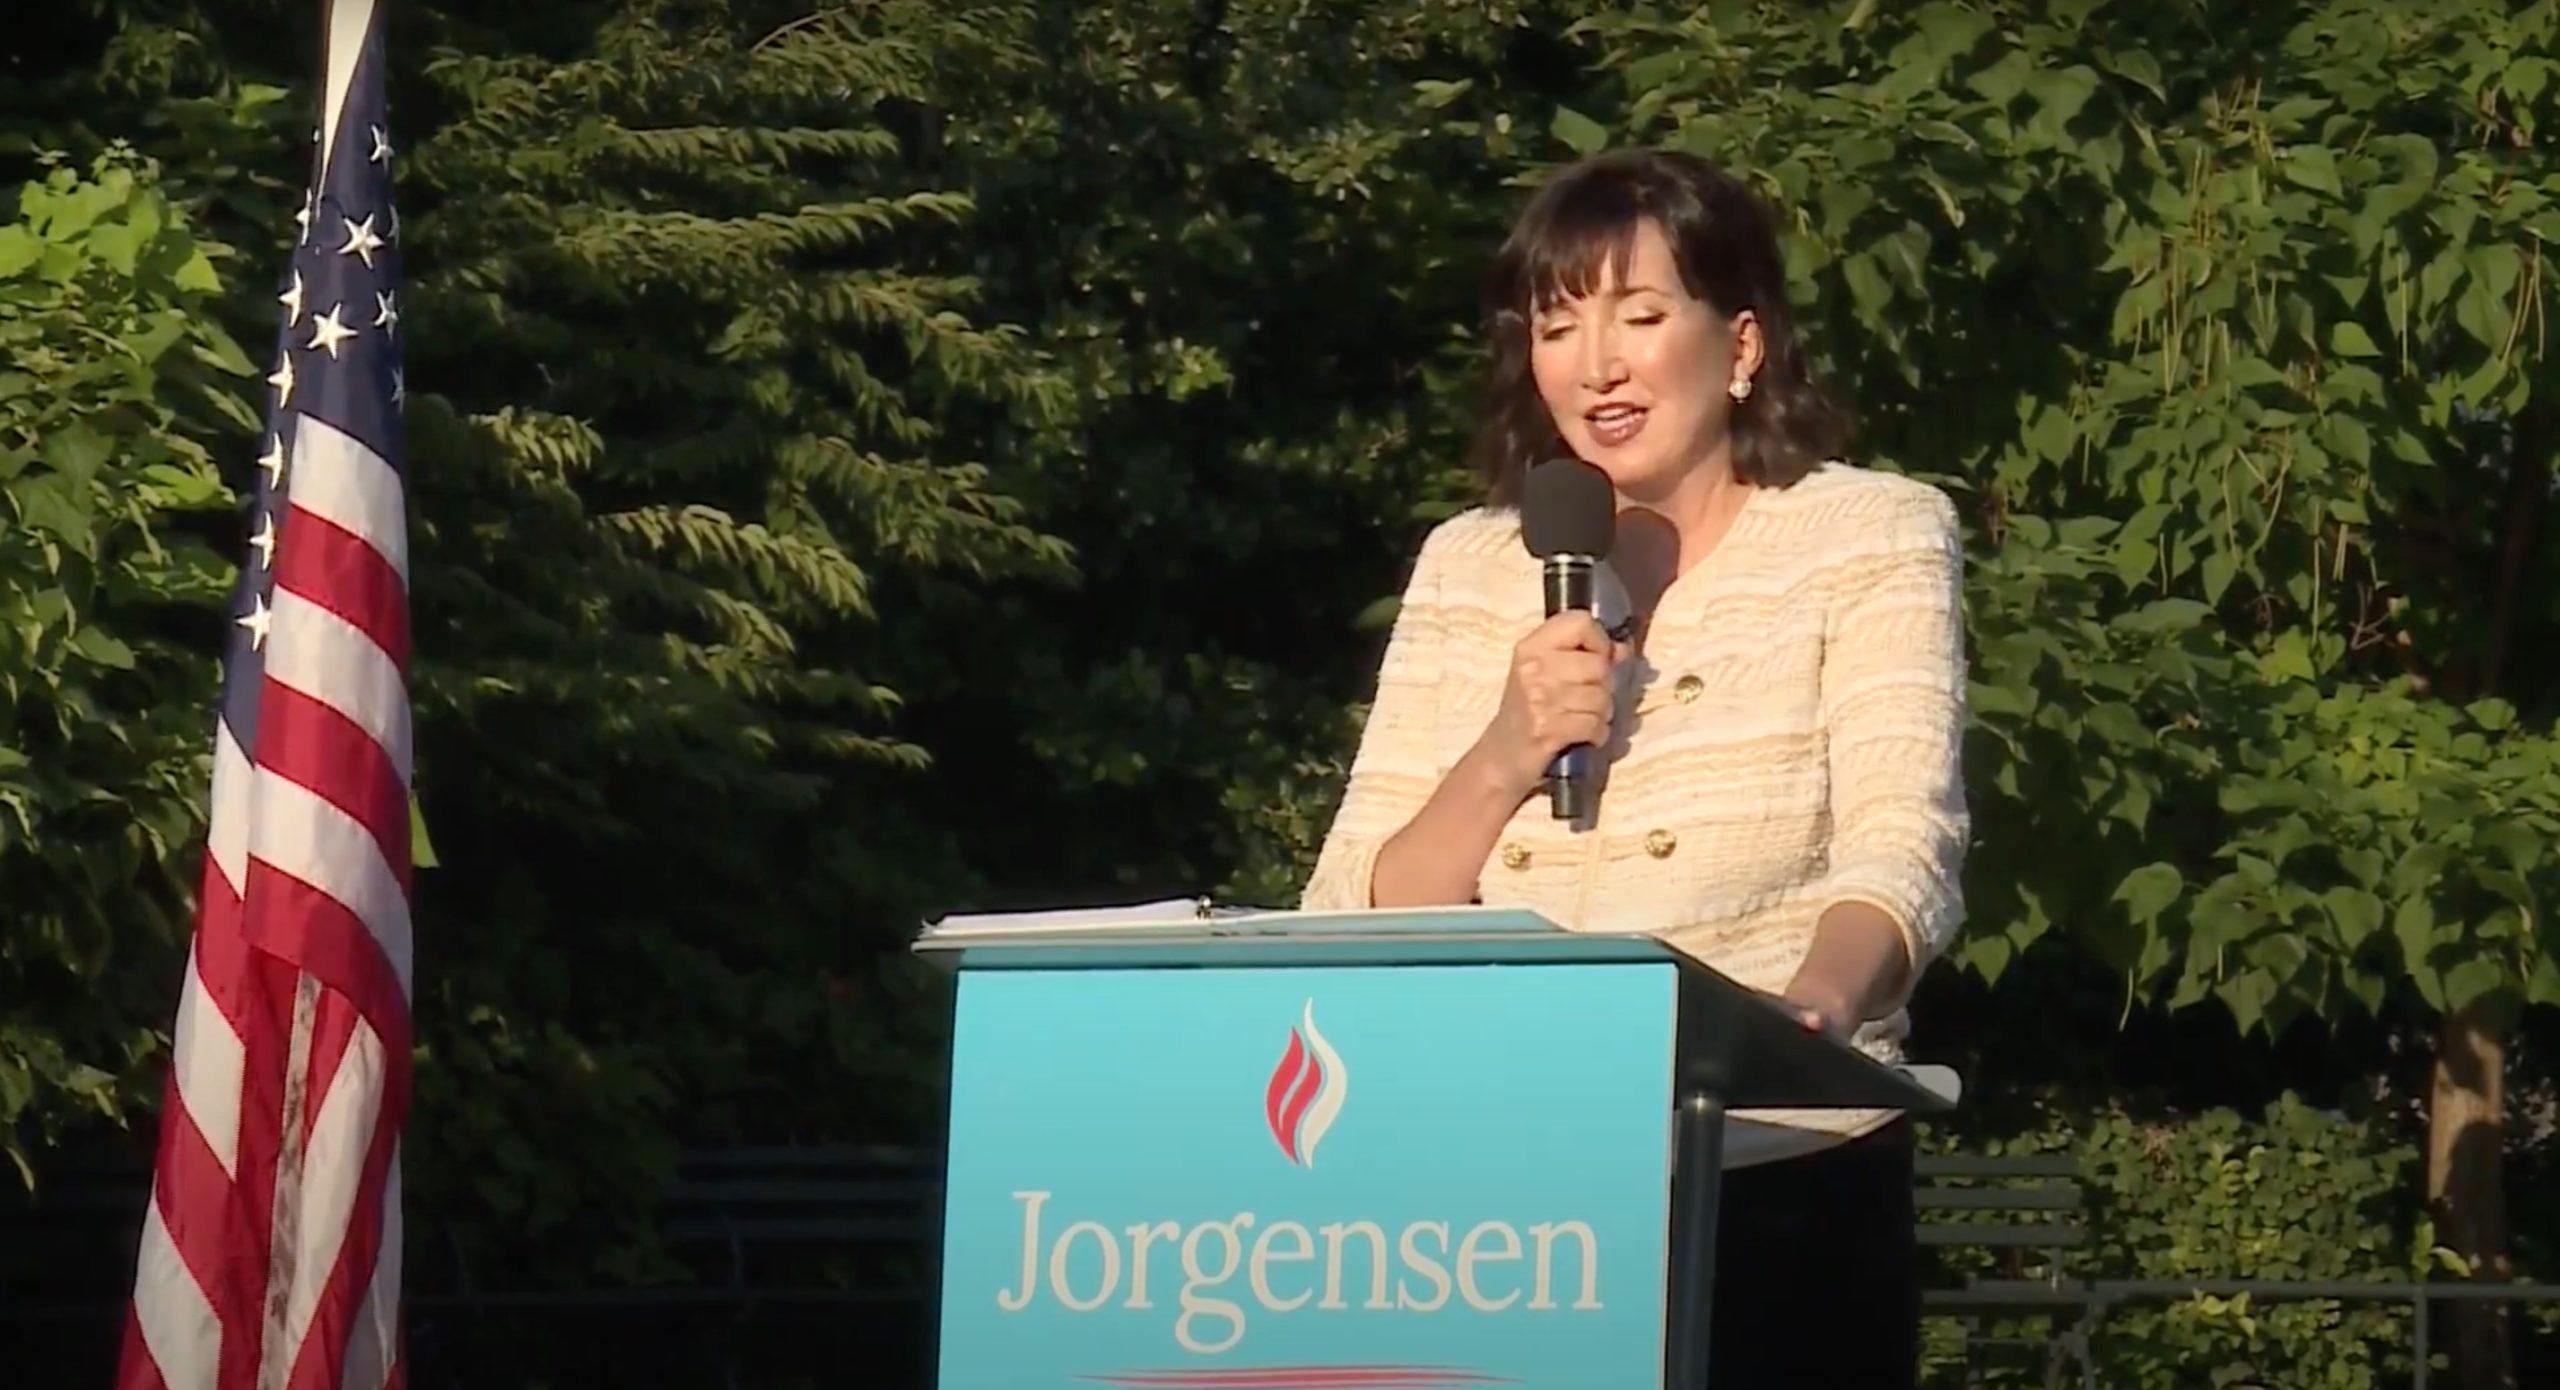 Libertarian Party presidential nominee Jo Jorgensen campaigns in St. Louis, Missouri in August. (FOX 2 St. Louis/Video screenshot/YouTube)